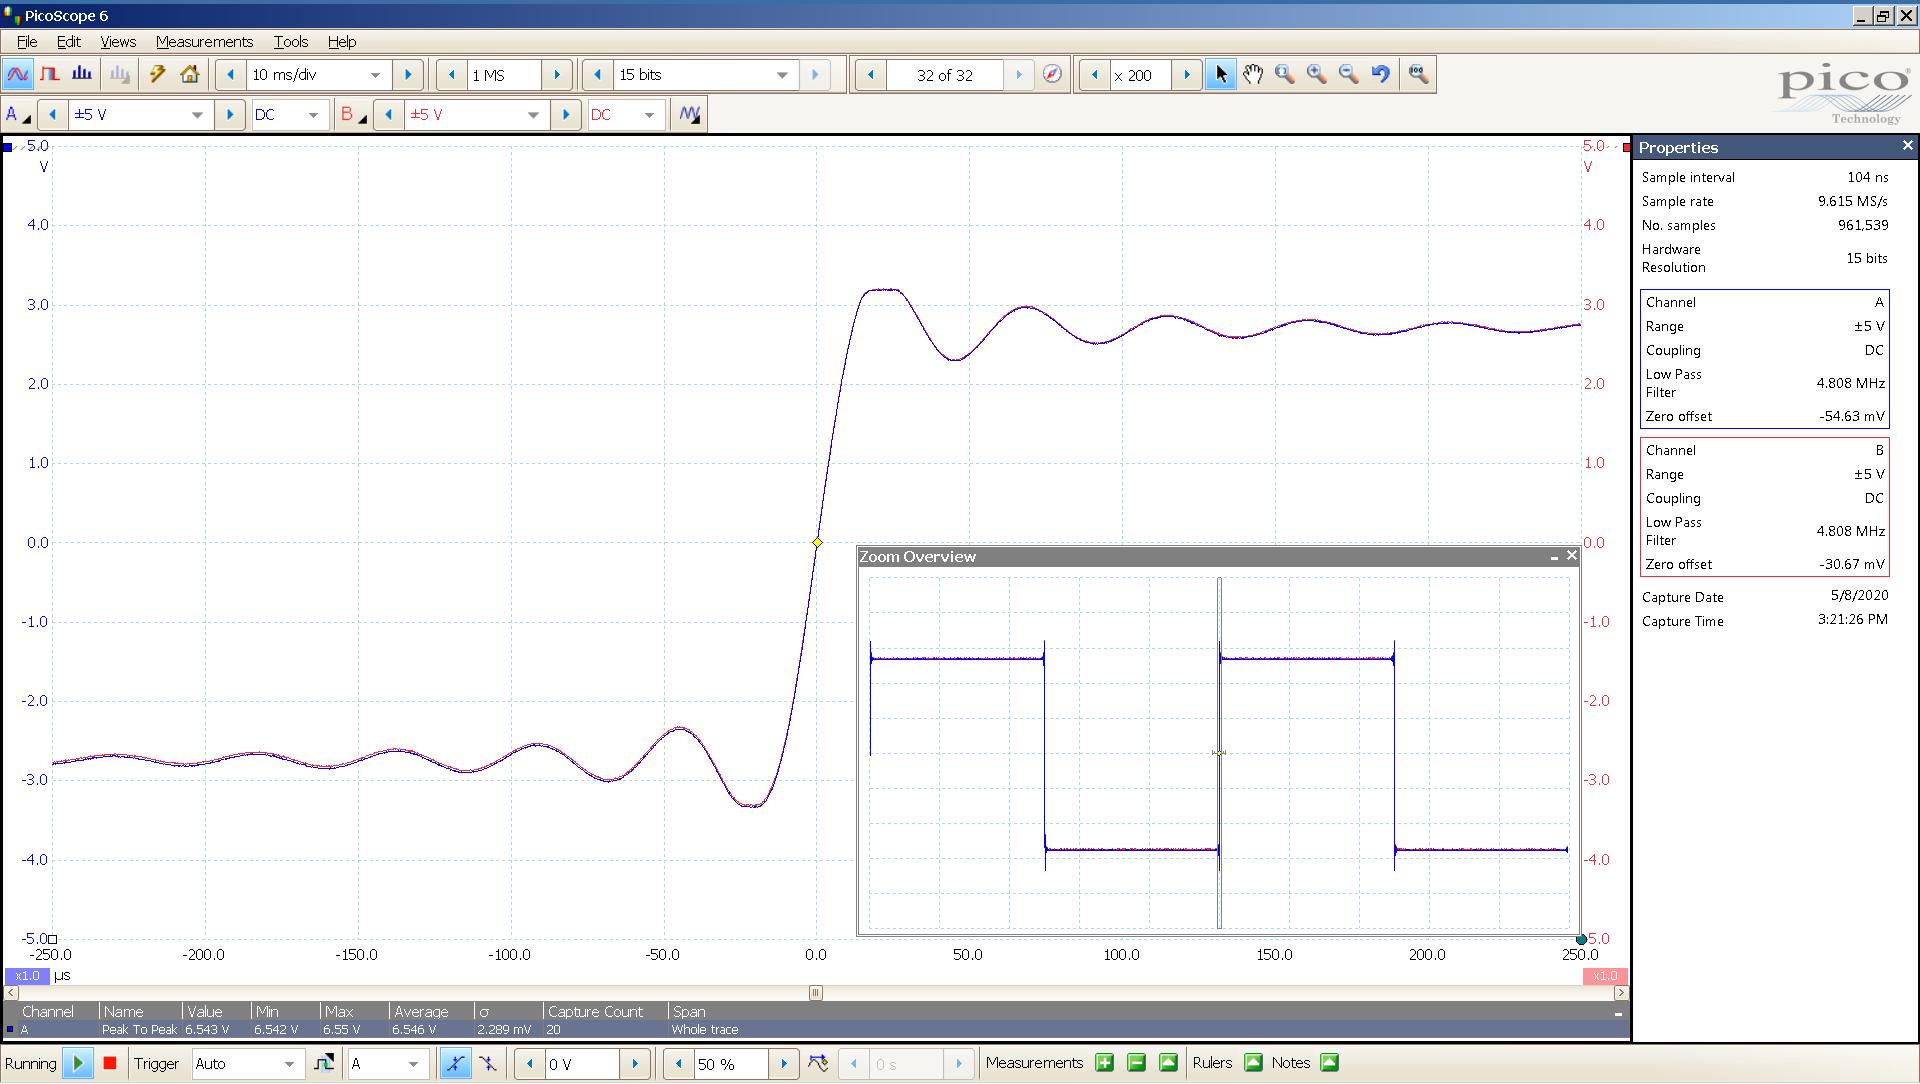 20200508-32 Matrix XSP fltr3 20 Hz sqr -1_0 dBFS 5_35 Vpp 50uS div AES SE.PNG